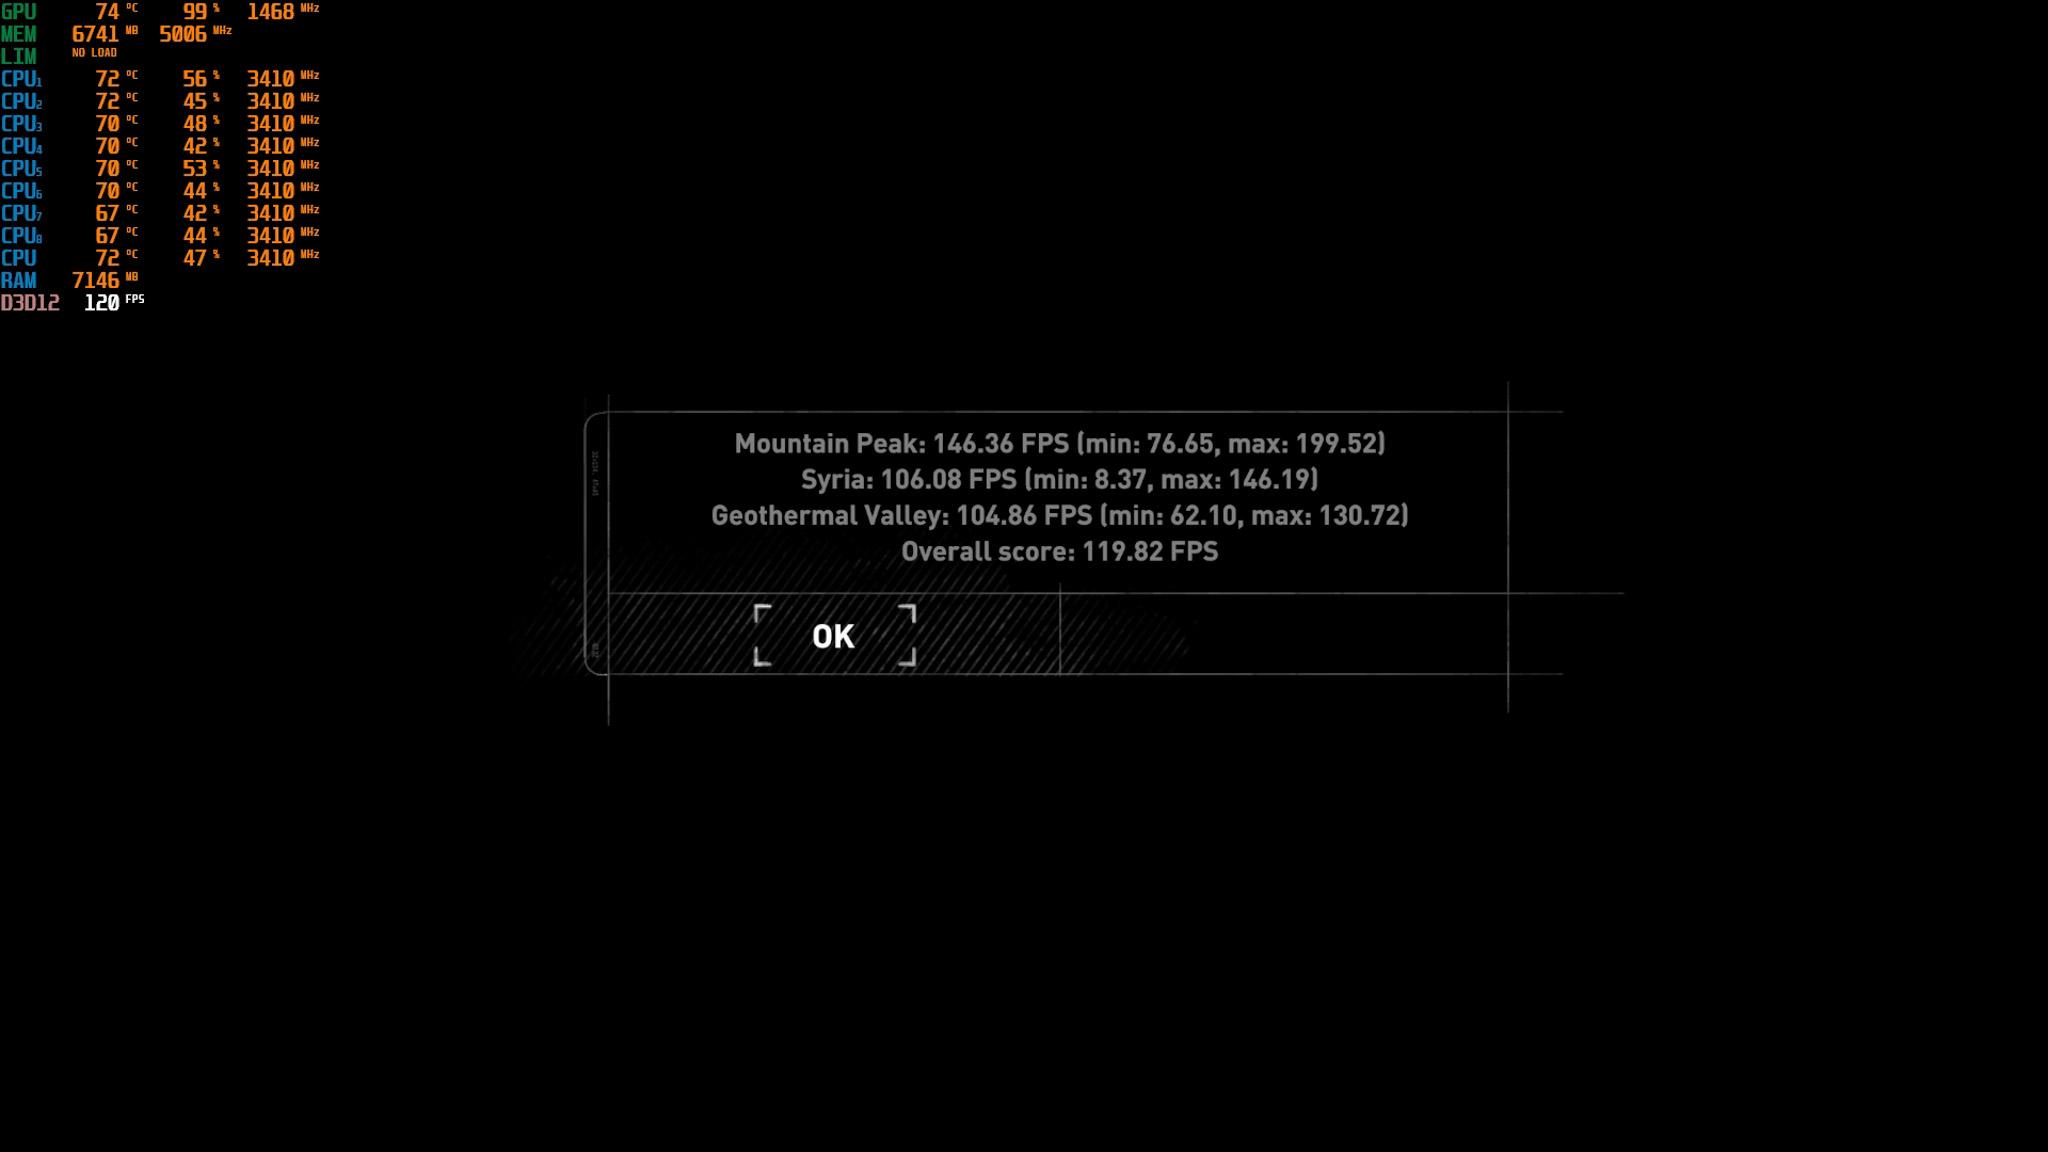 Triton_700_test-3.jpg